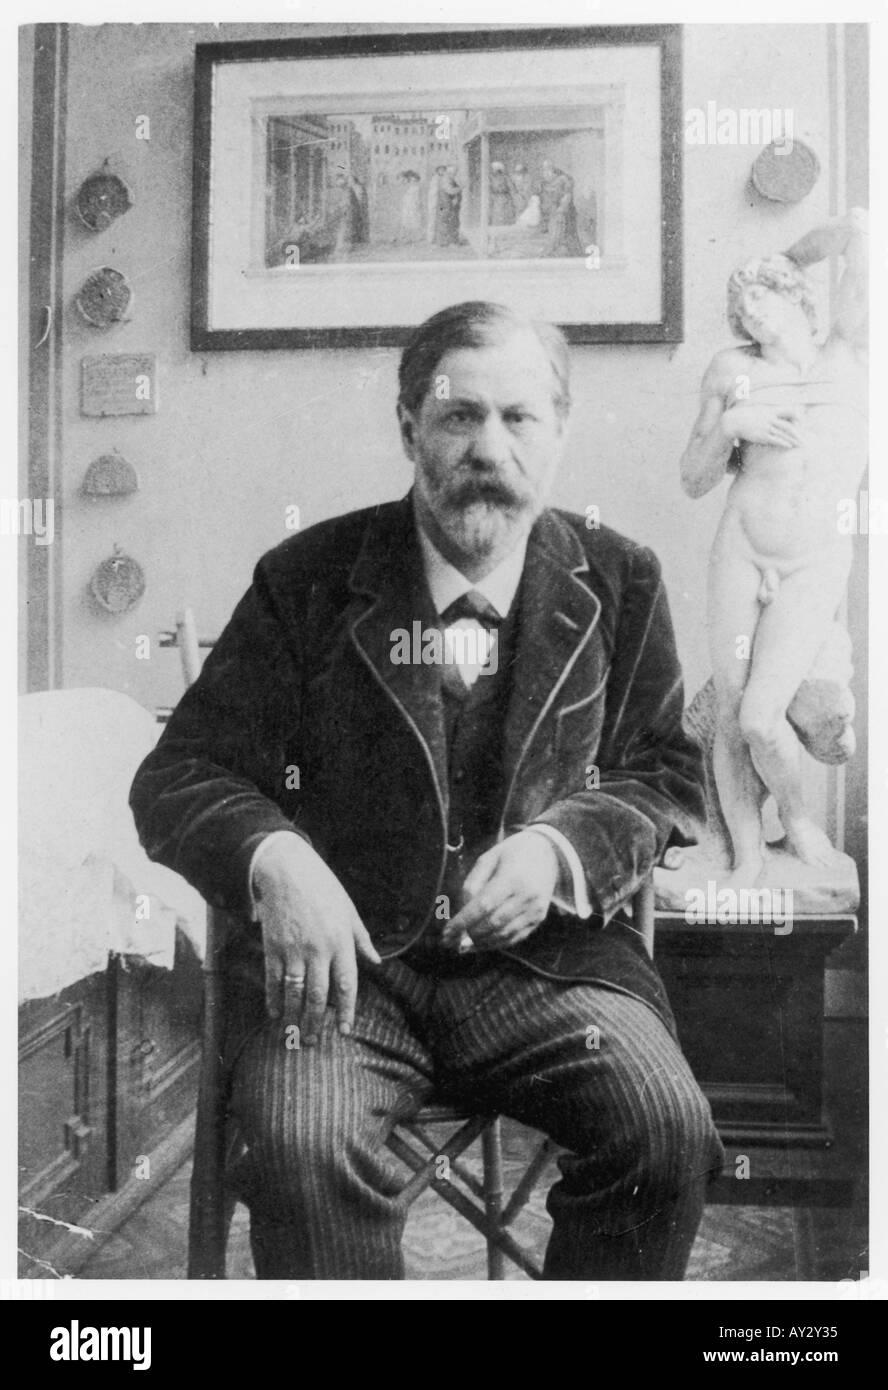 Sigmund Freud 1914 Neg 6 - Stock Image